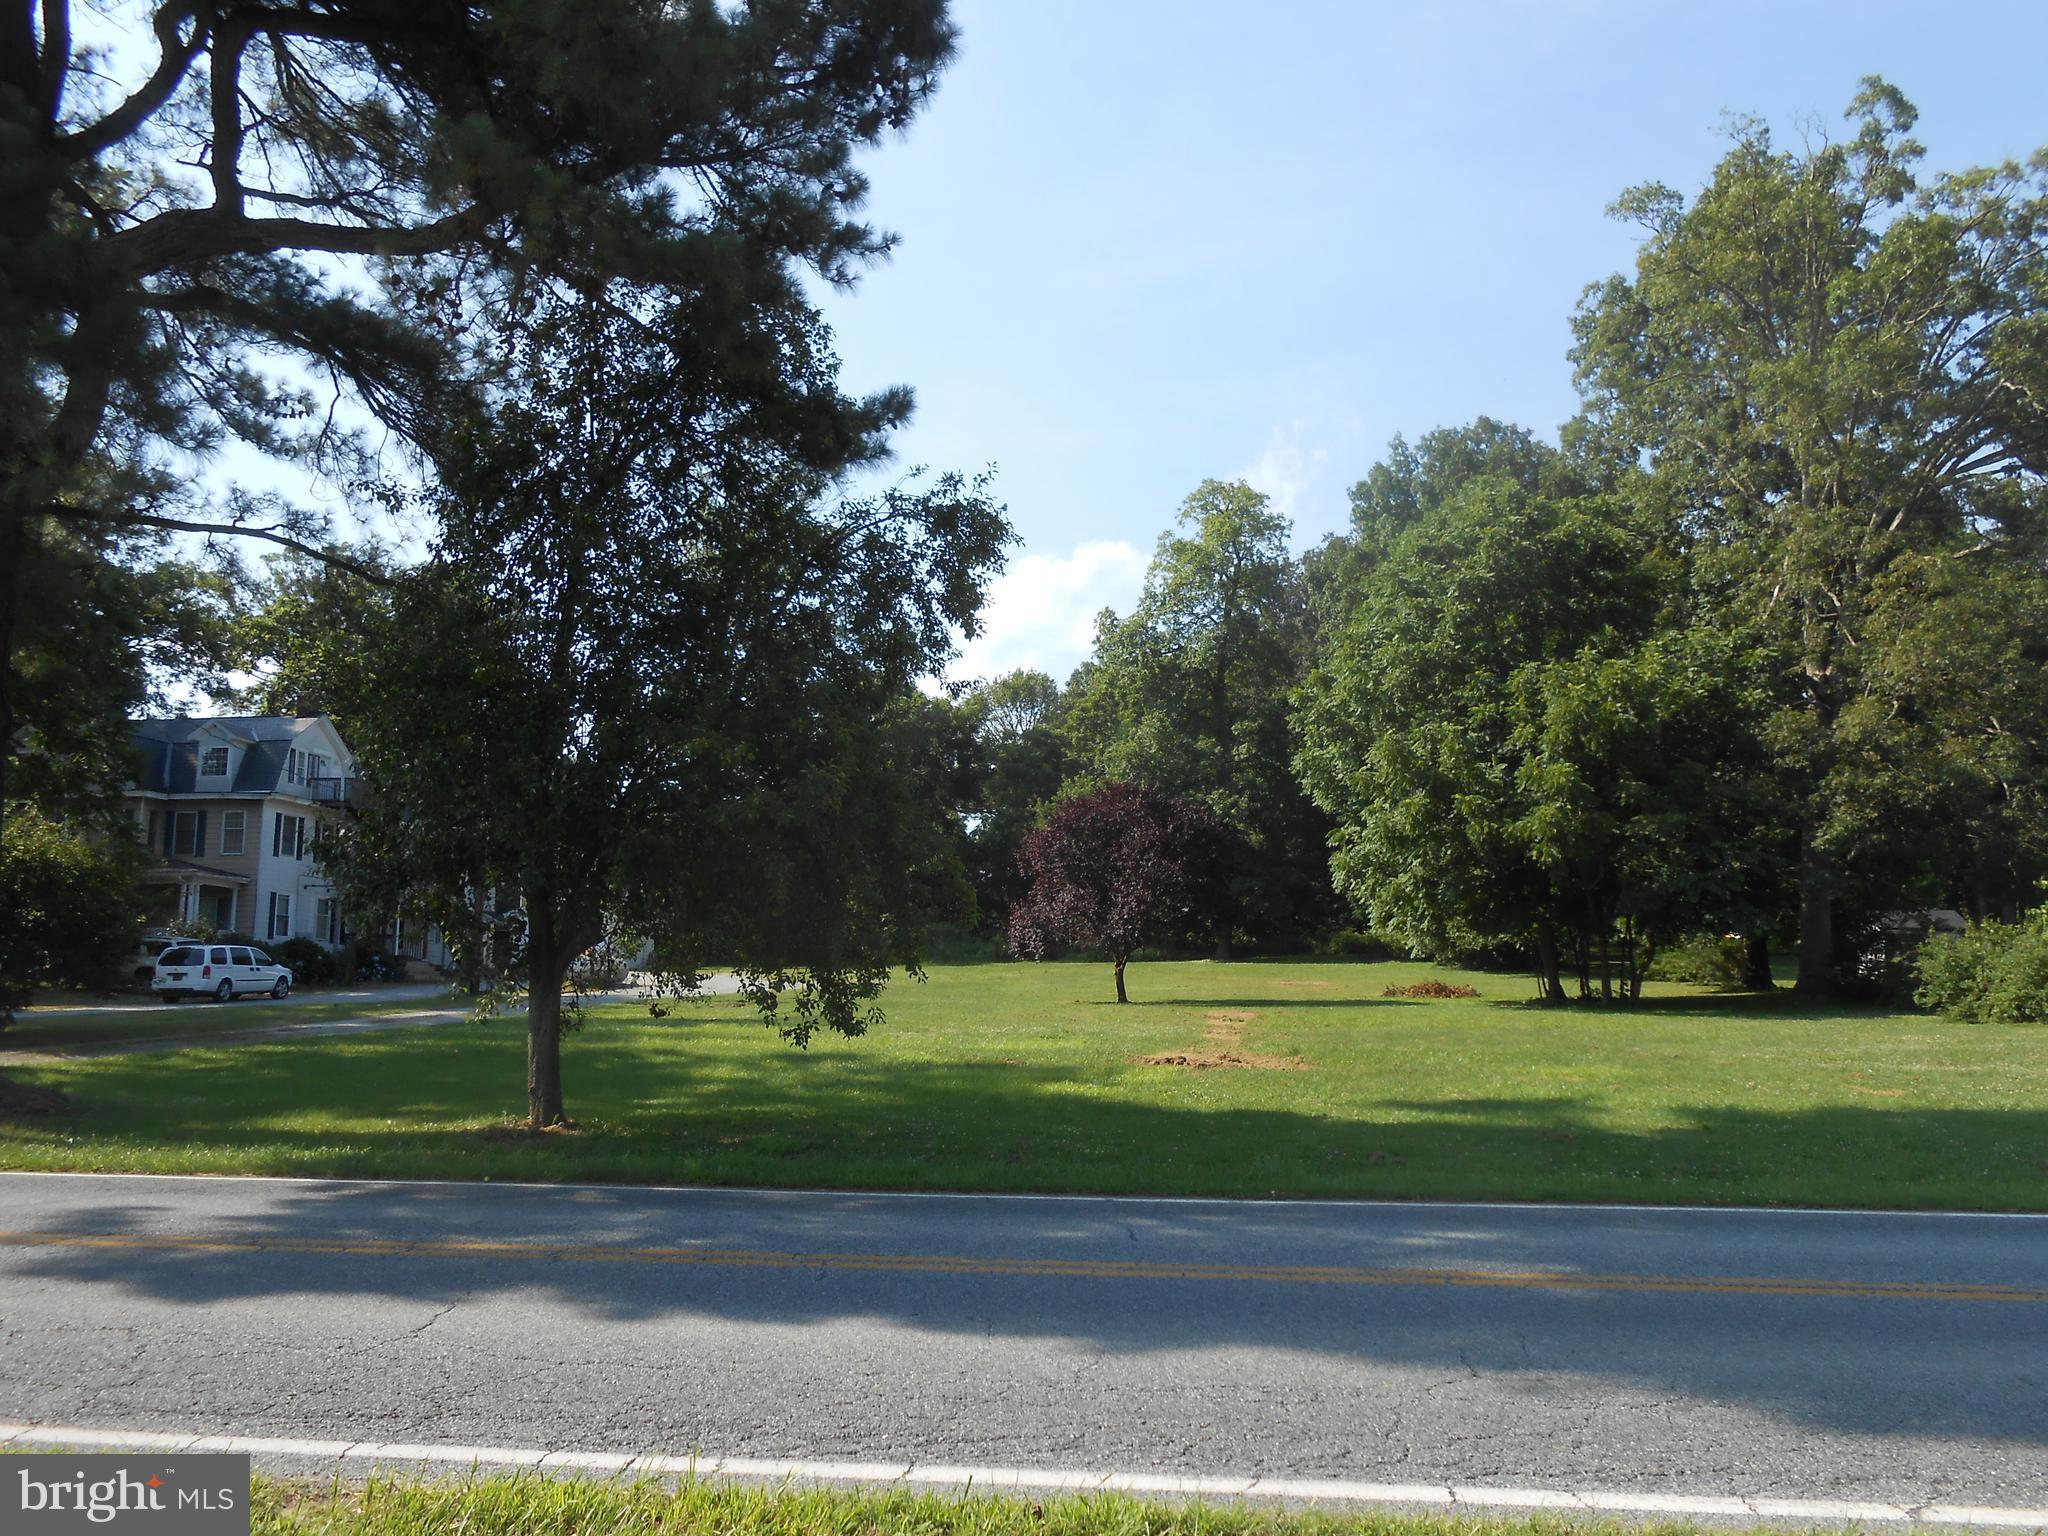 2561 LIBERTY GROVE ROAD, COLORA, MD 21917